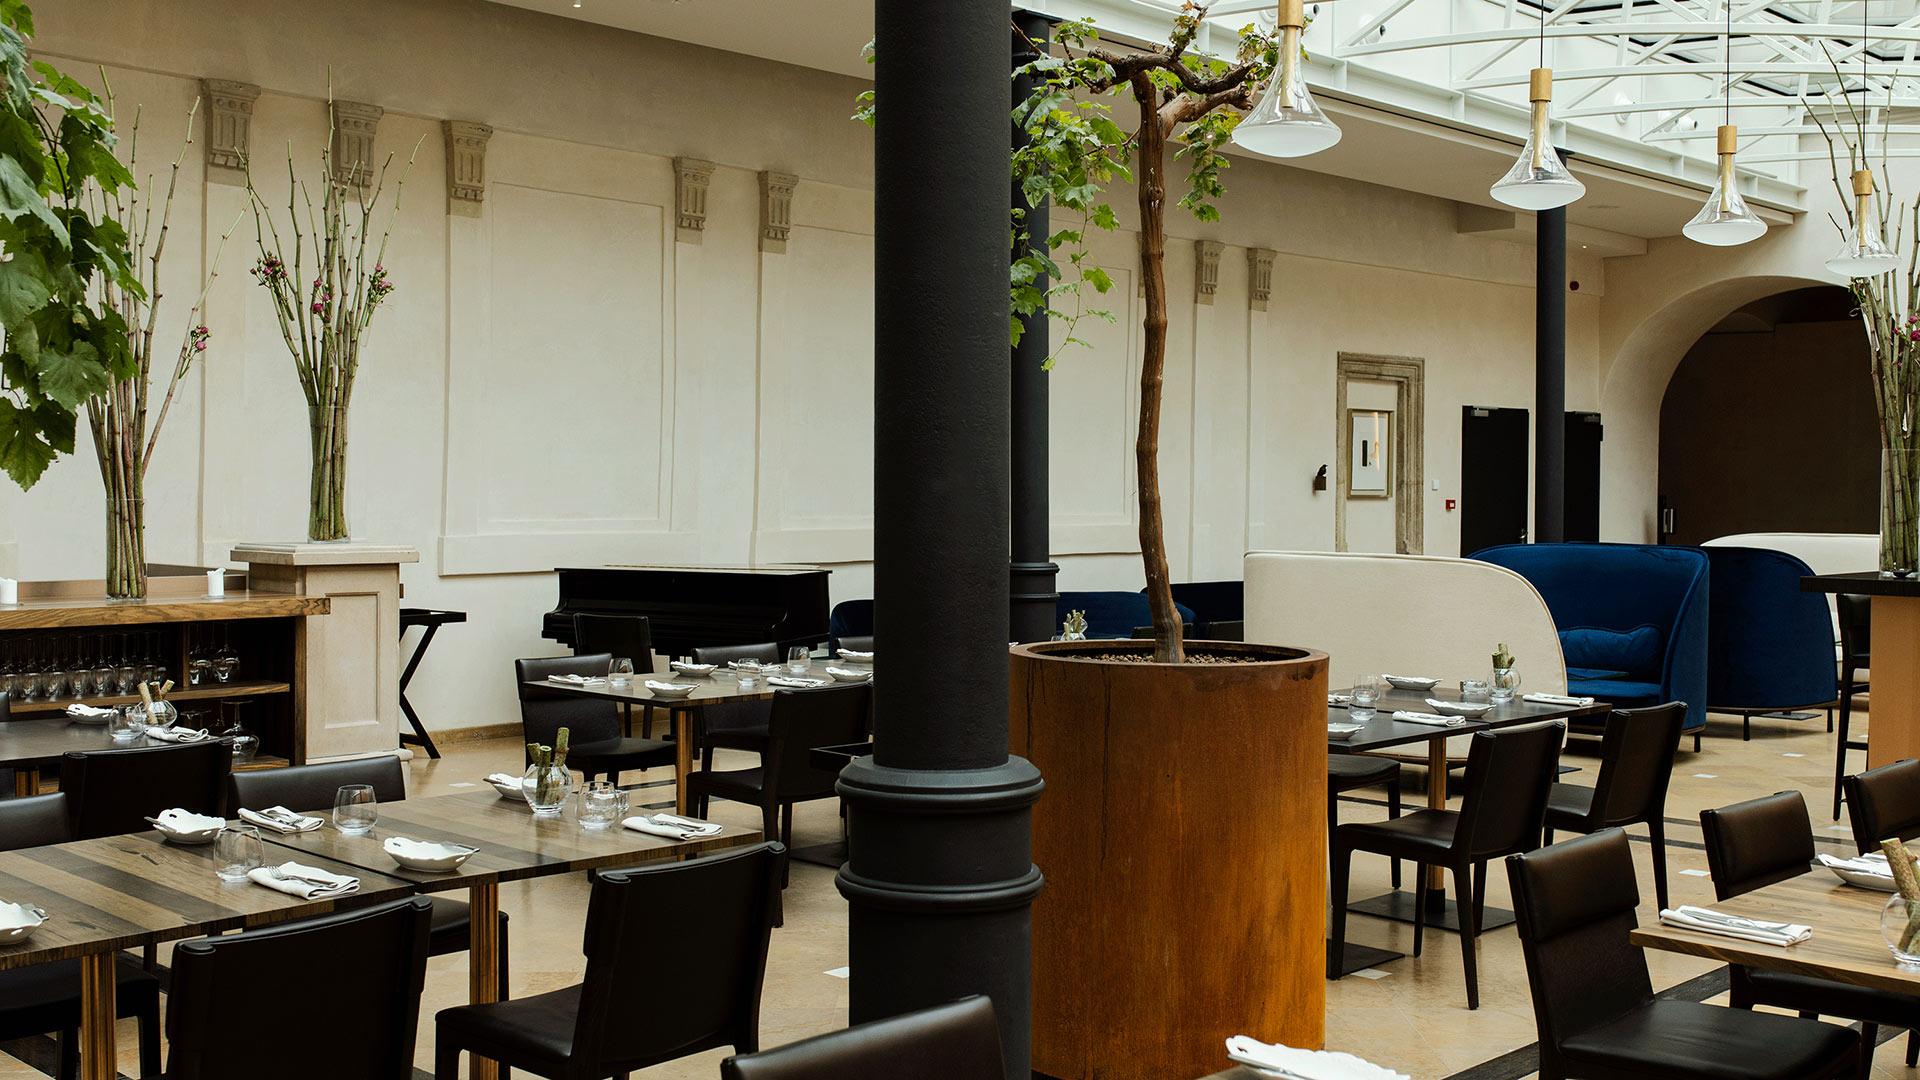 https://manager.lbooking.online/CmsImages/hotel-pod-roza-krakow-restauracja-pod-roza